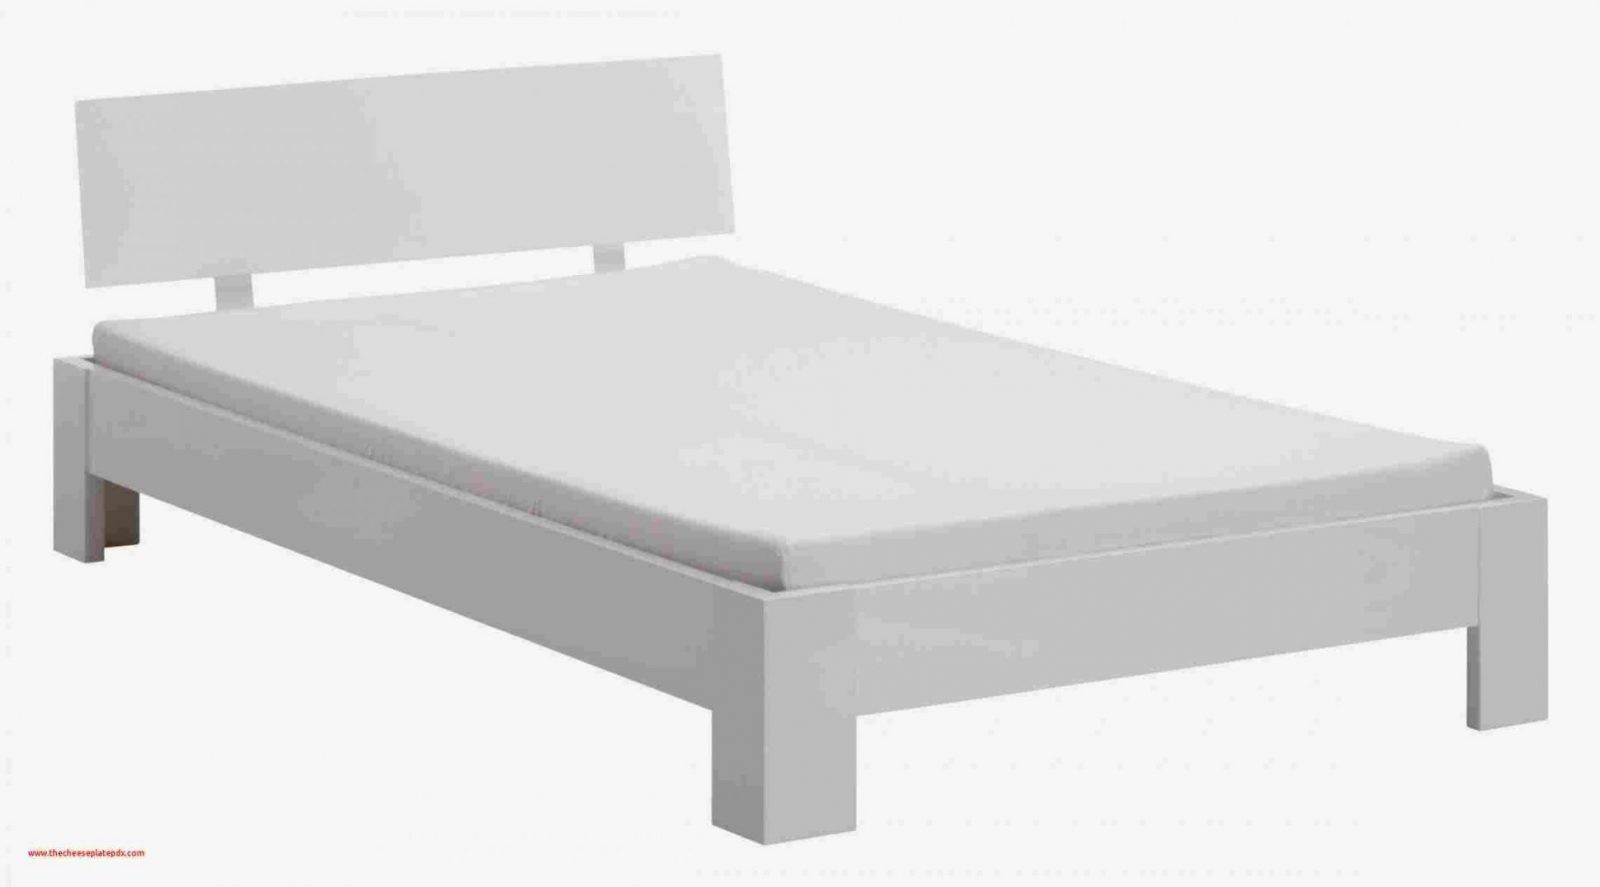 Kreativ Ikea Betten 140X200 Weiss Bett Metall Schwarz Elegant von Weißes Bett 140X200 Ikea Bild